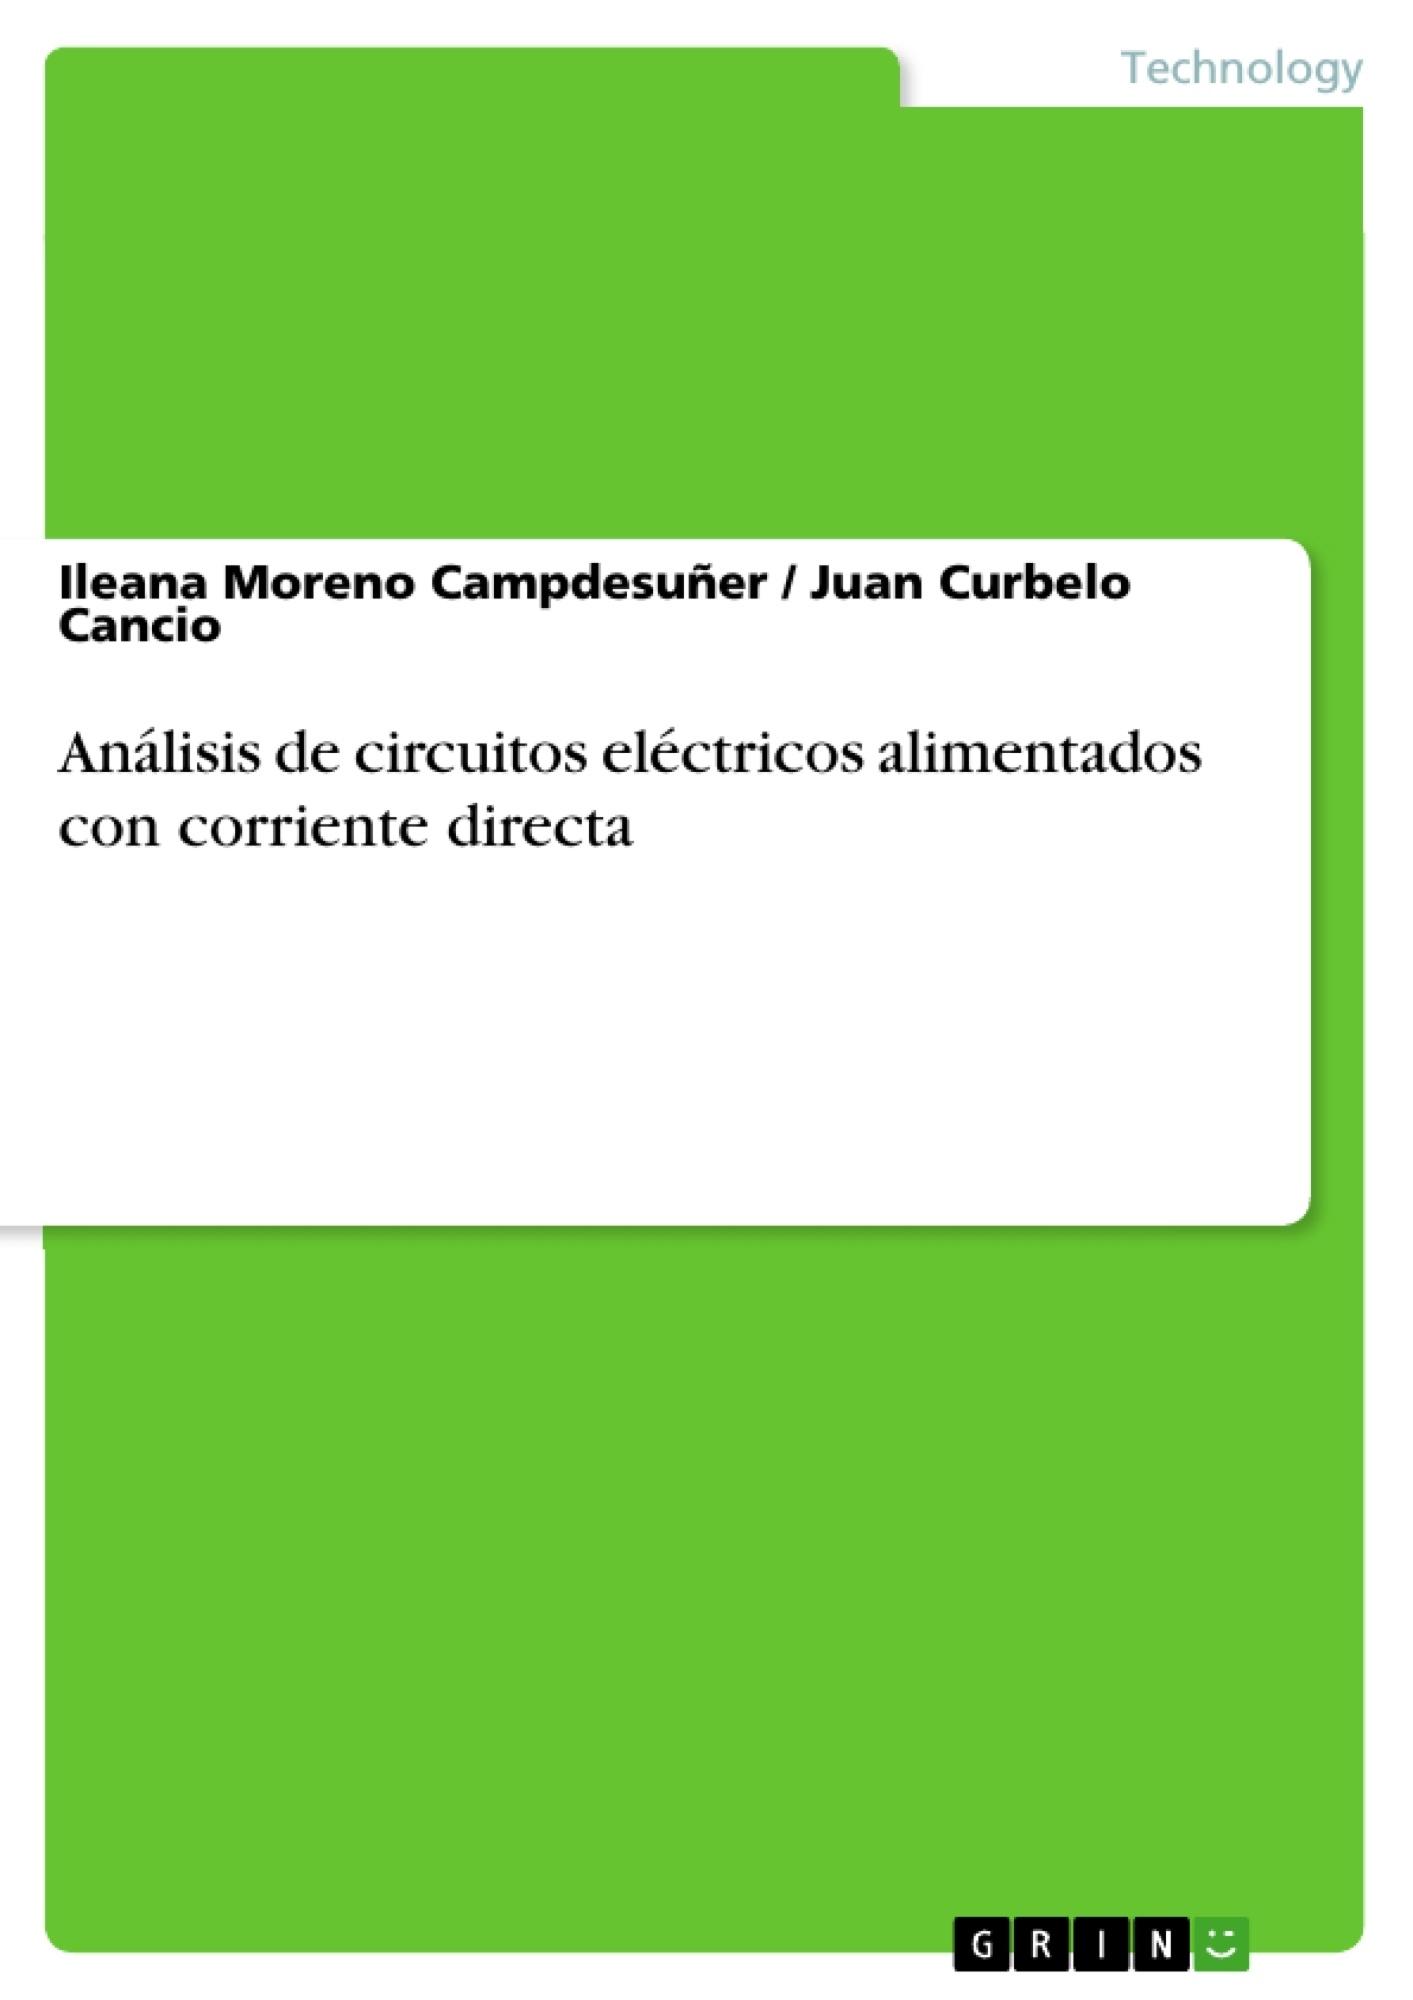 Título: Análisis de circuitos eléctricos alimentados con corriente directa